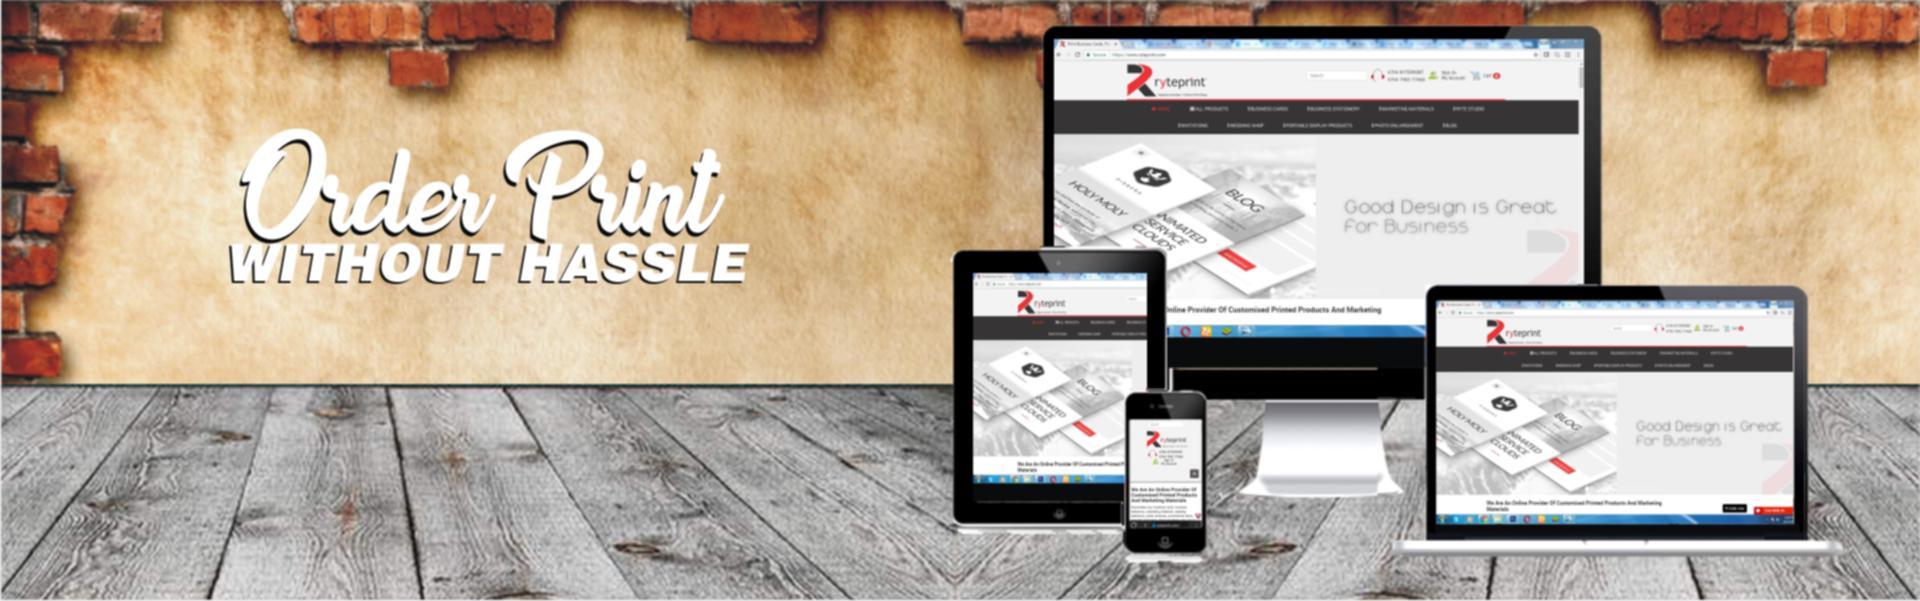 Ryteprint Online